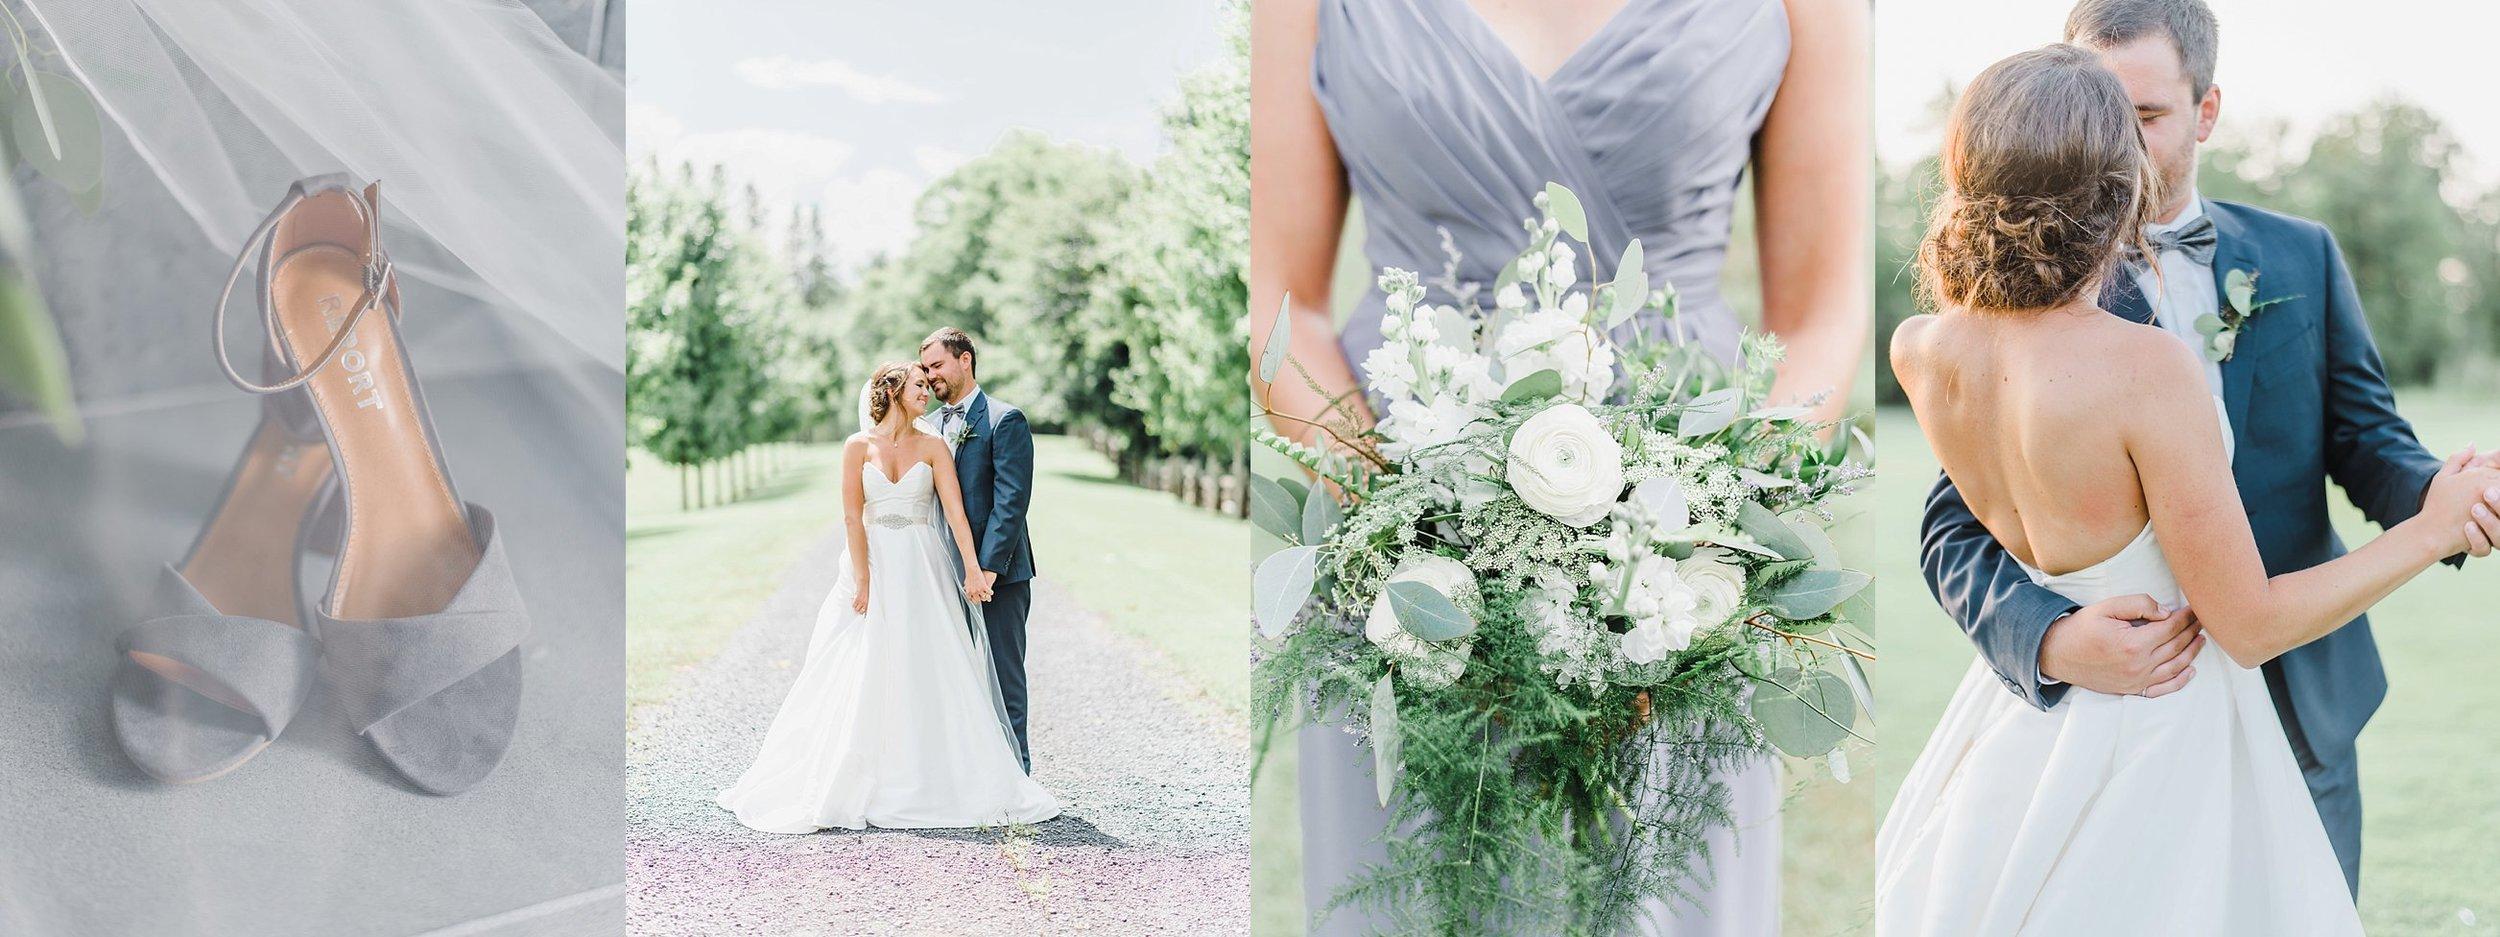 light airy indie fine art ottawa wedding photographer | Ali and Batoul Photography_0606.jpg